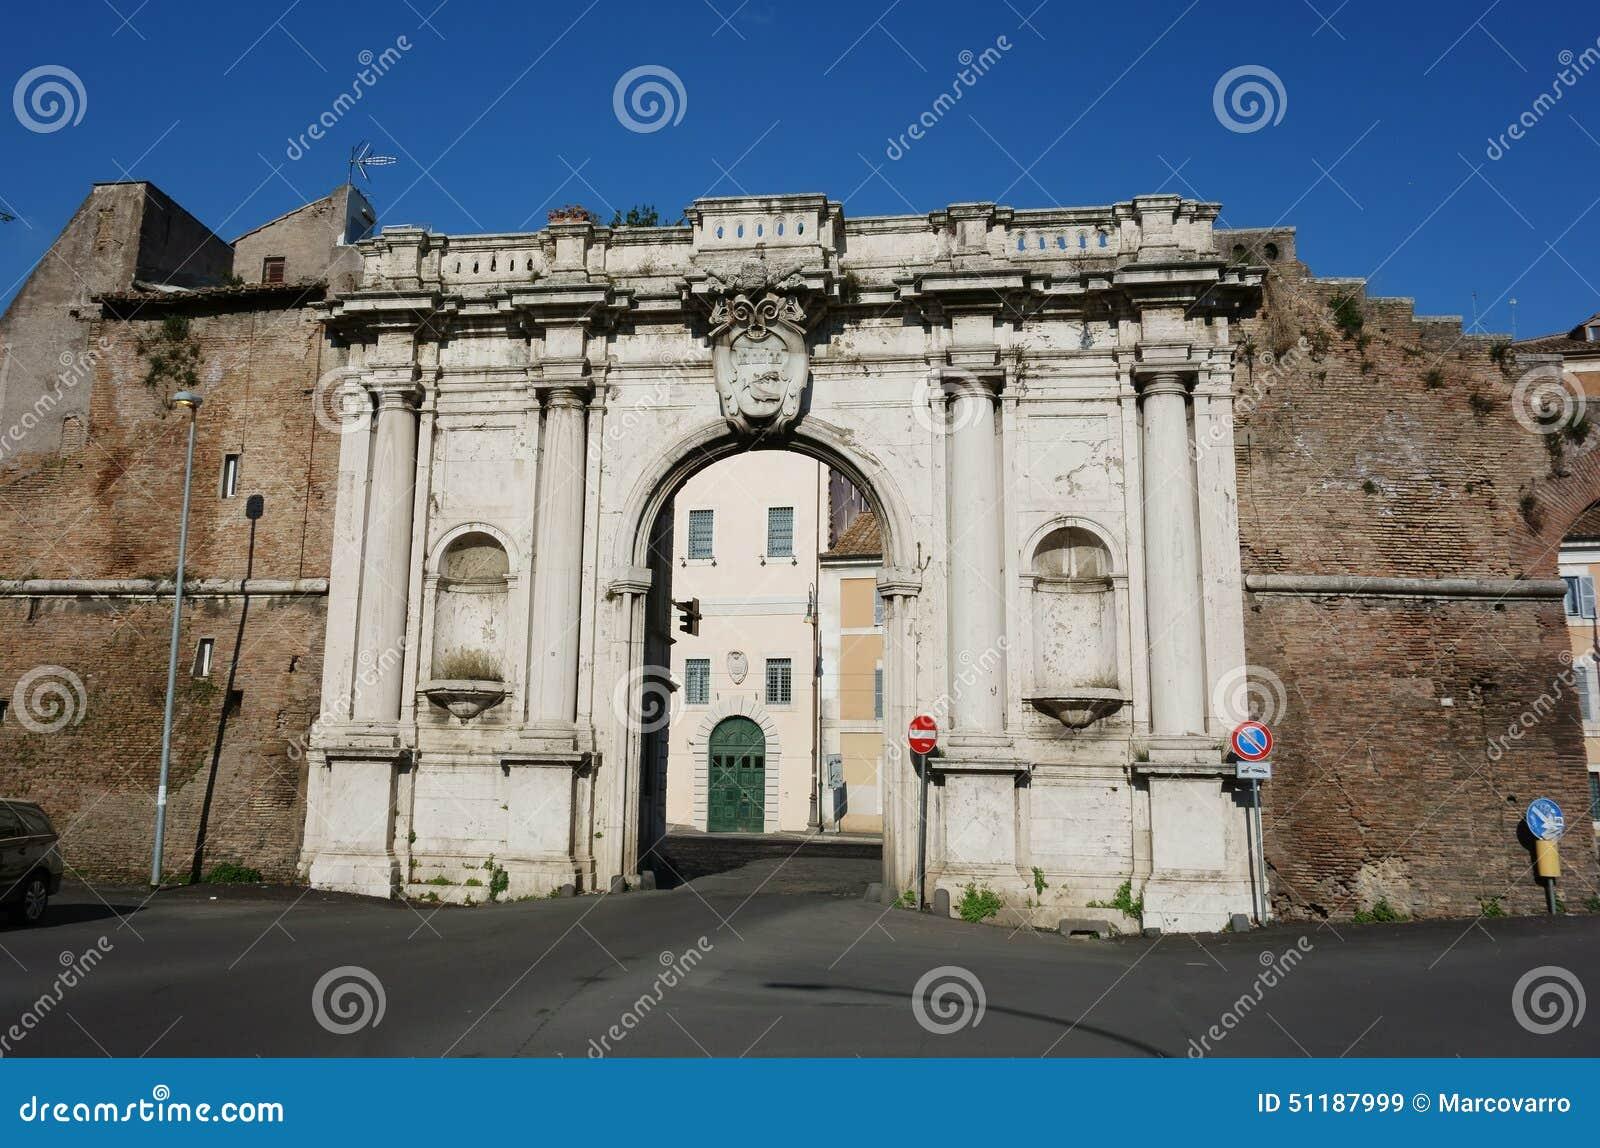 Ancient porta portese gate in rome stock photo image - Porta portese 2 ...